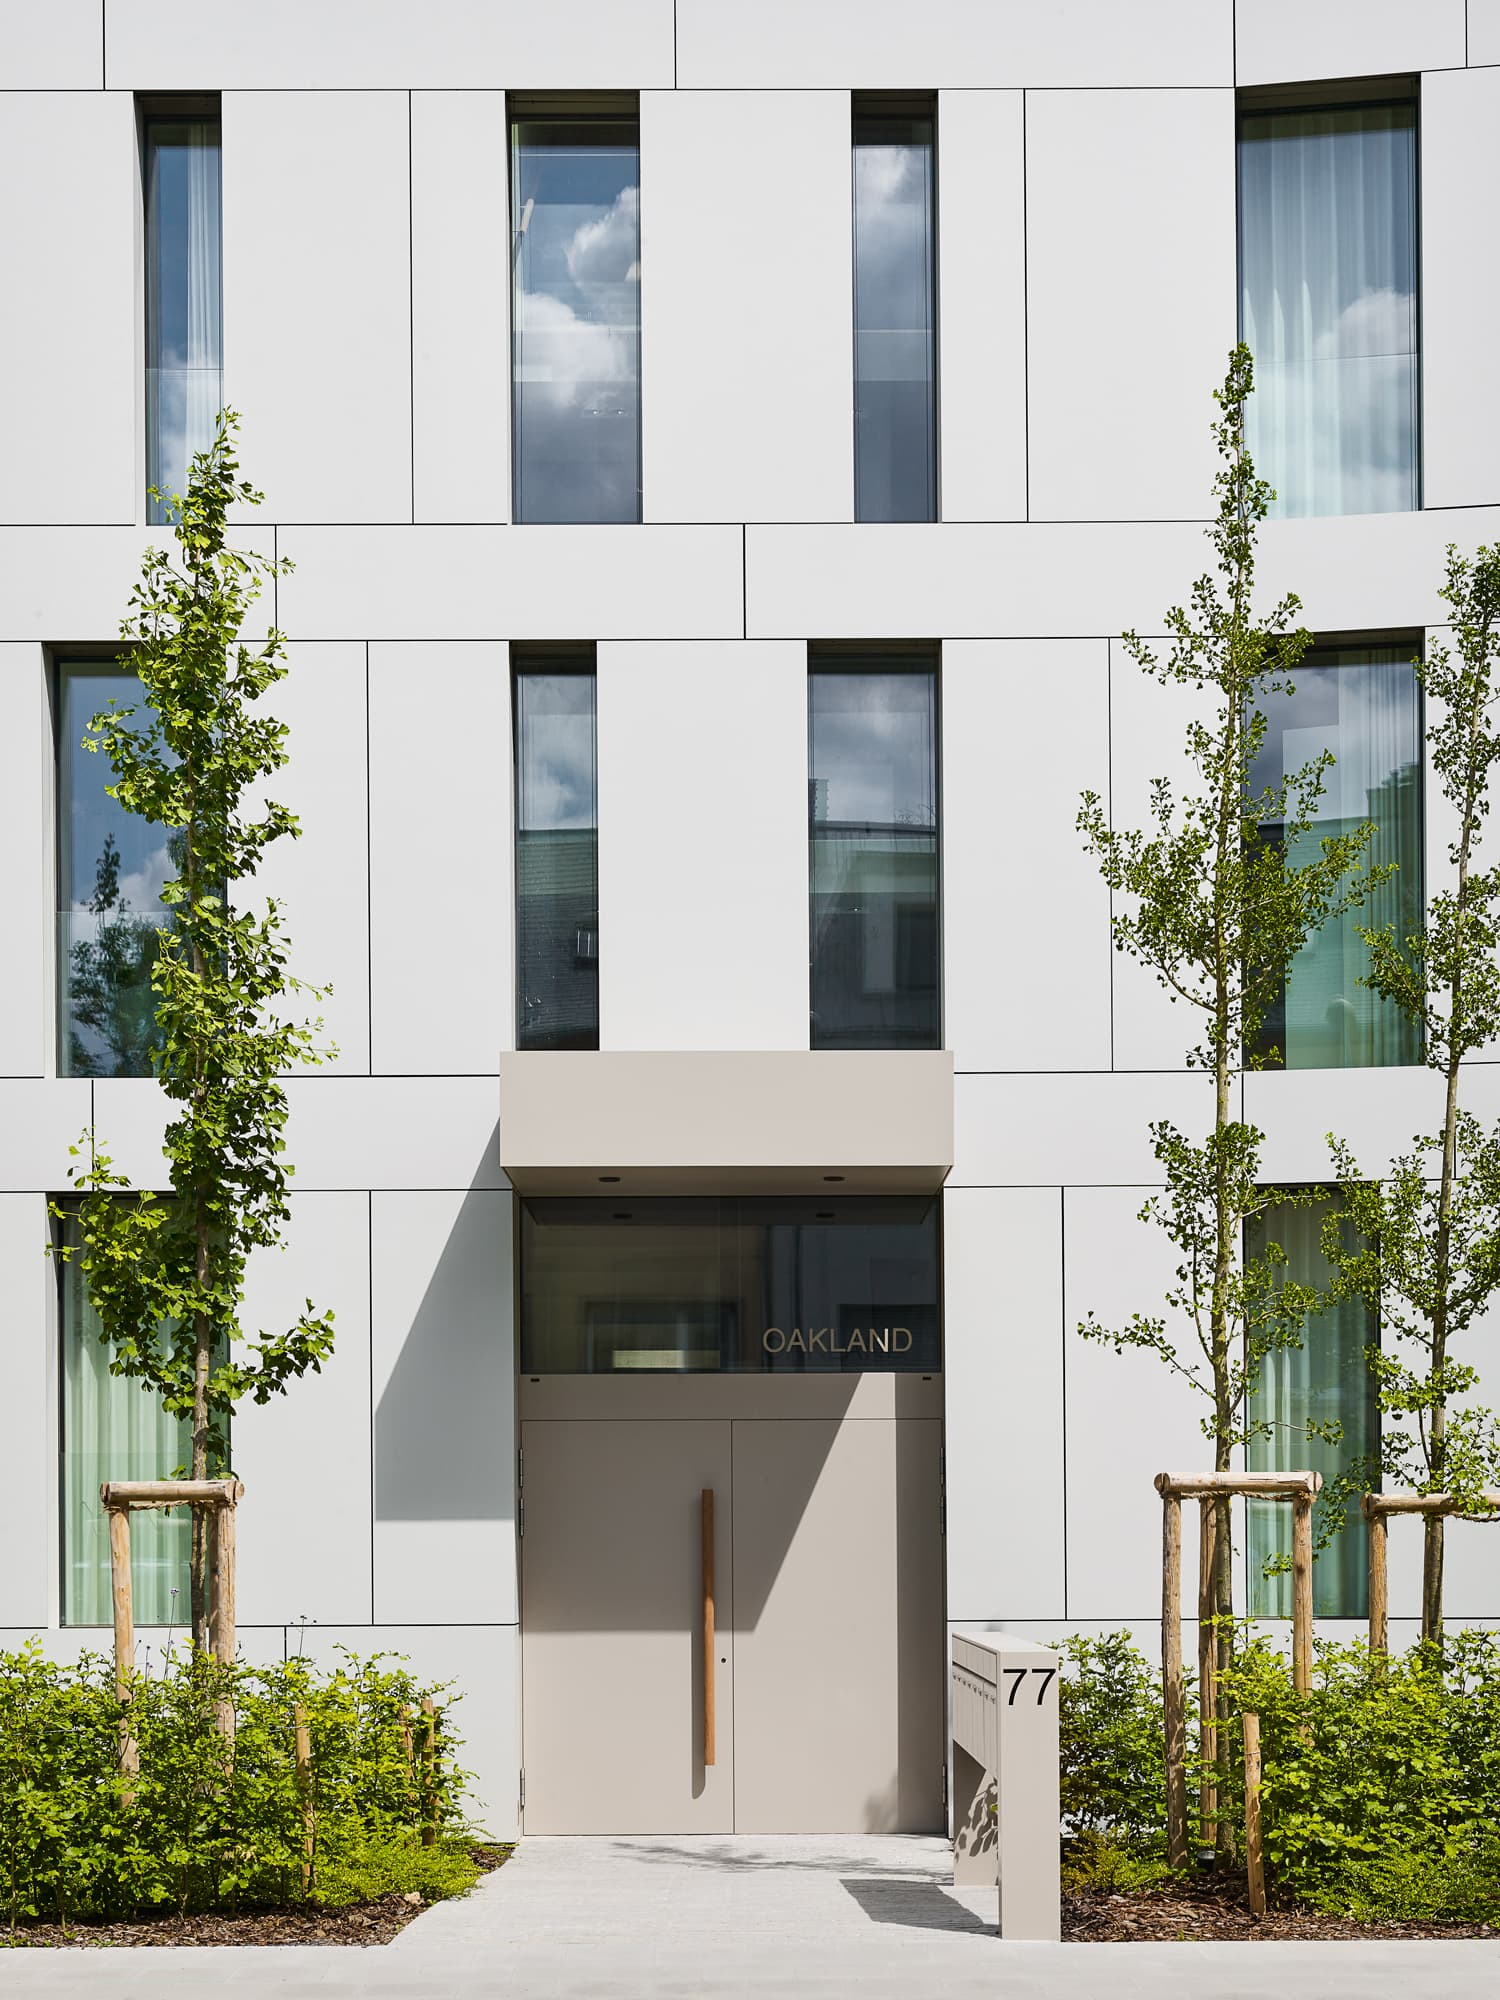 Oakland | CBA | Christian Bauer & Associés Architectes s.a.